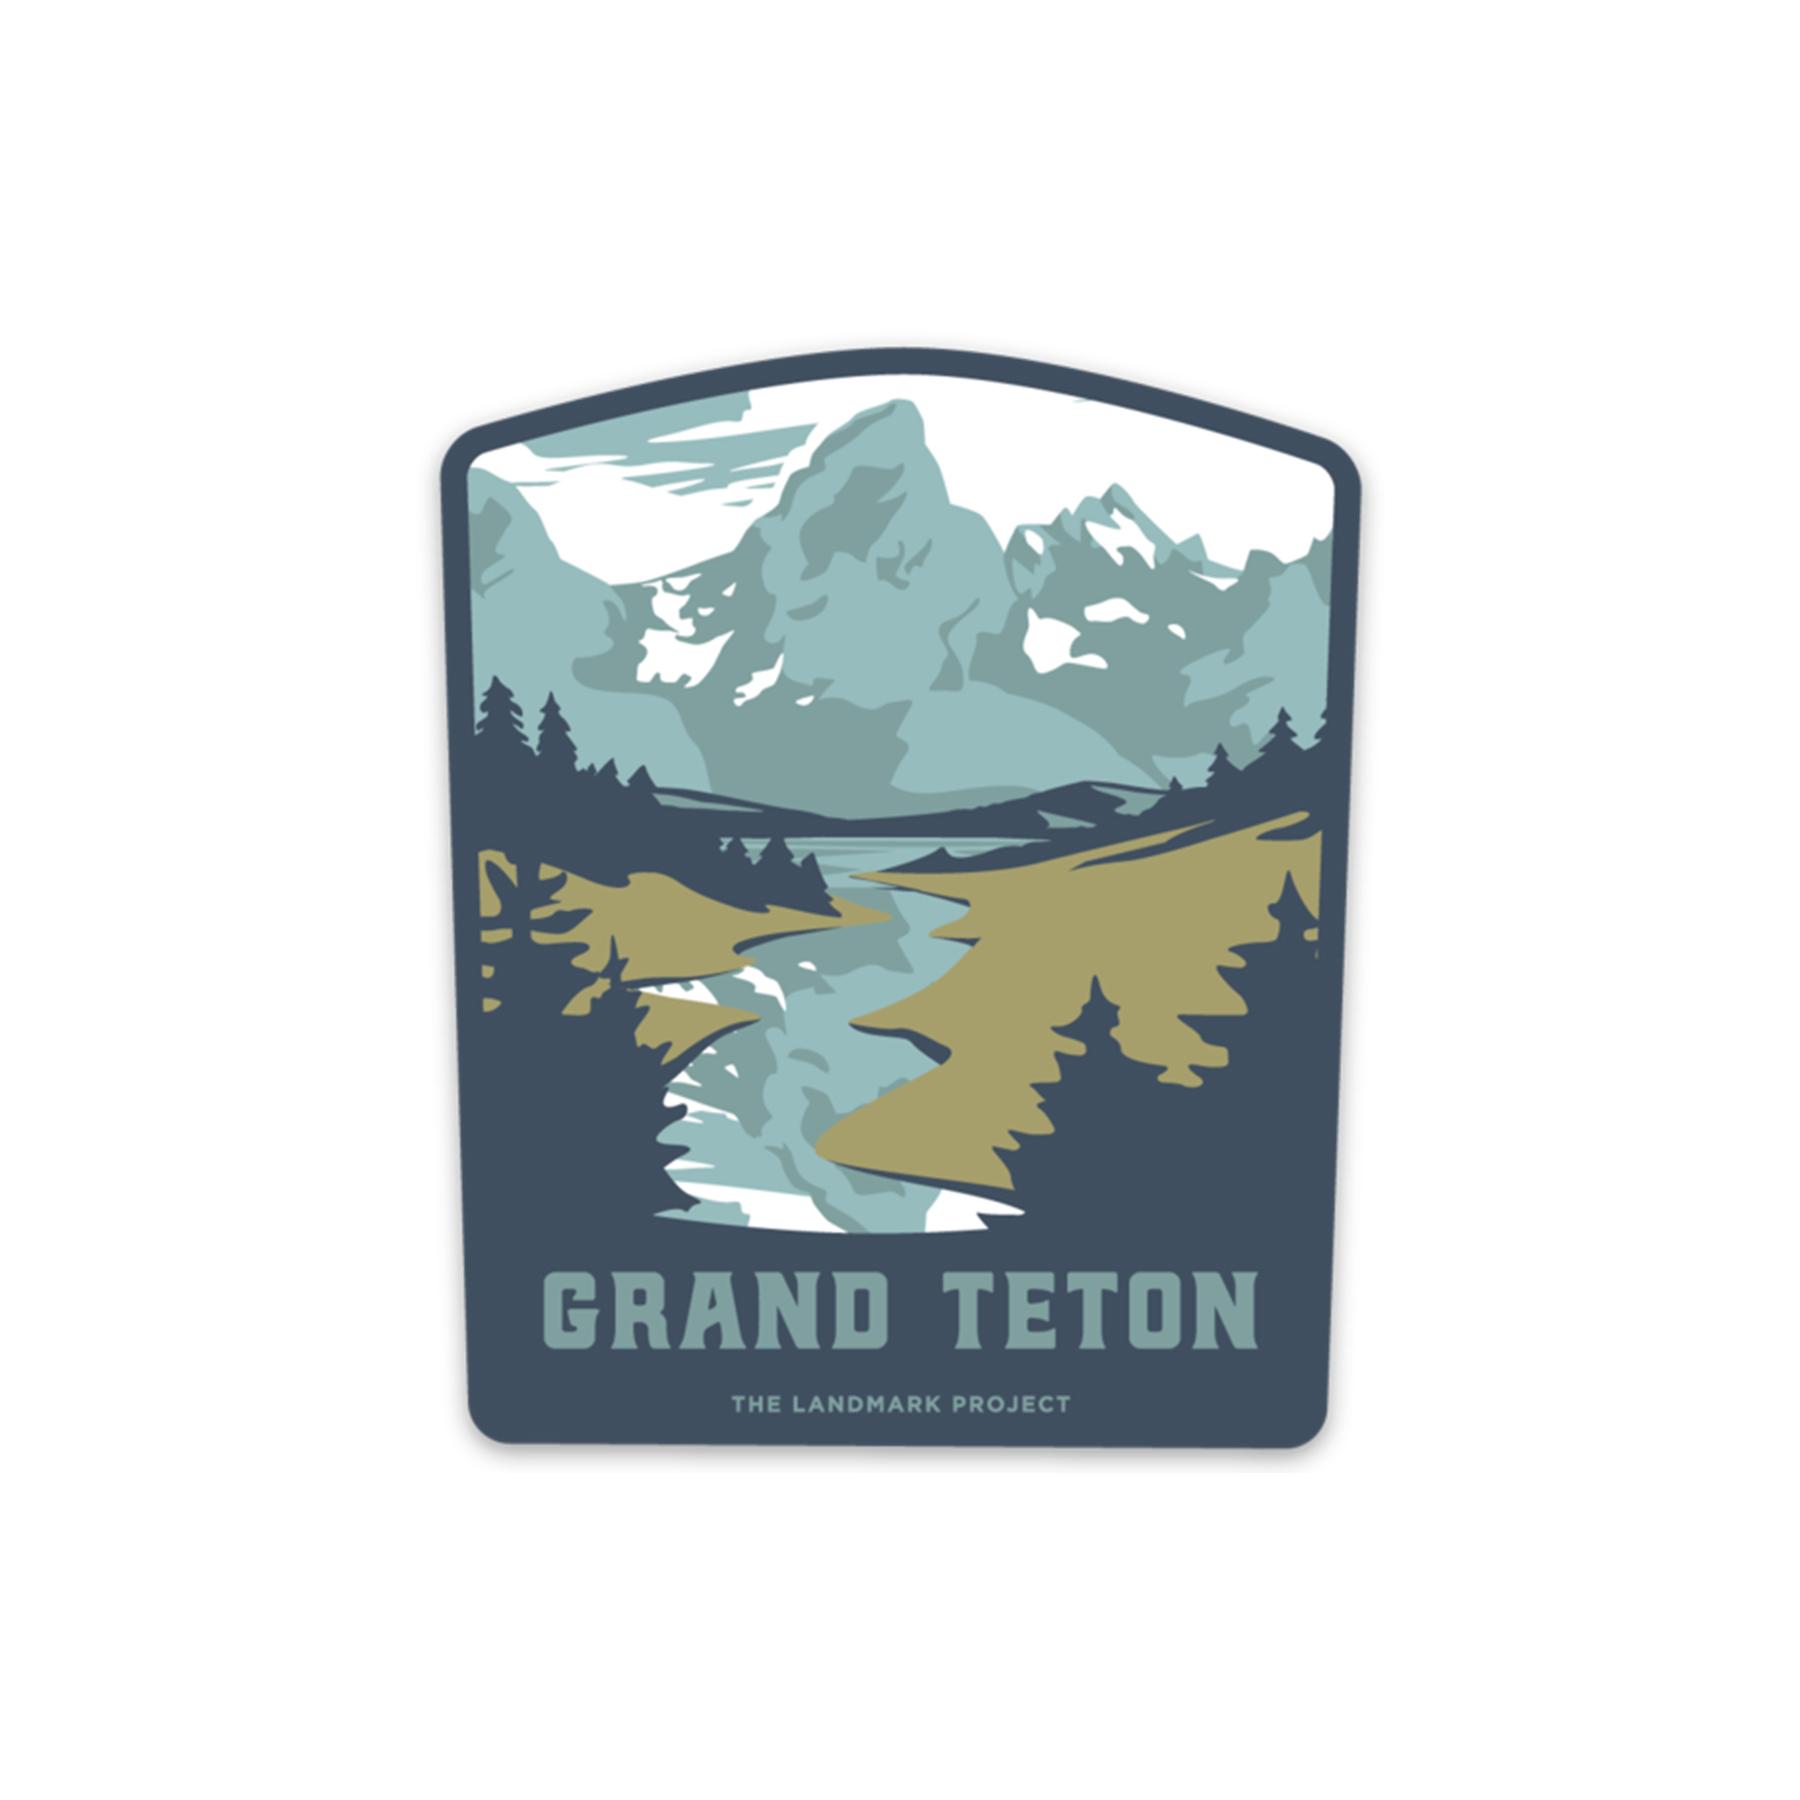 grand-tetons-sticker-2.jpg